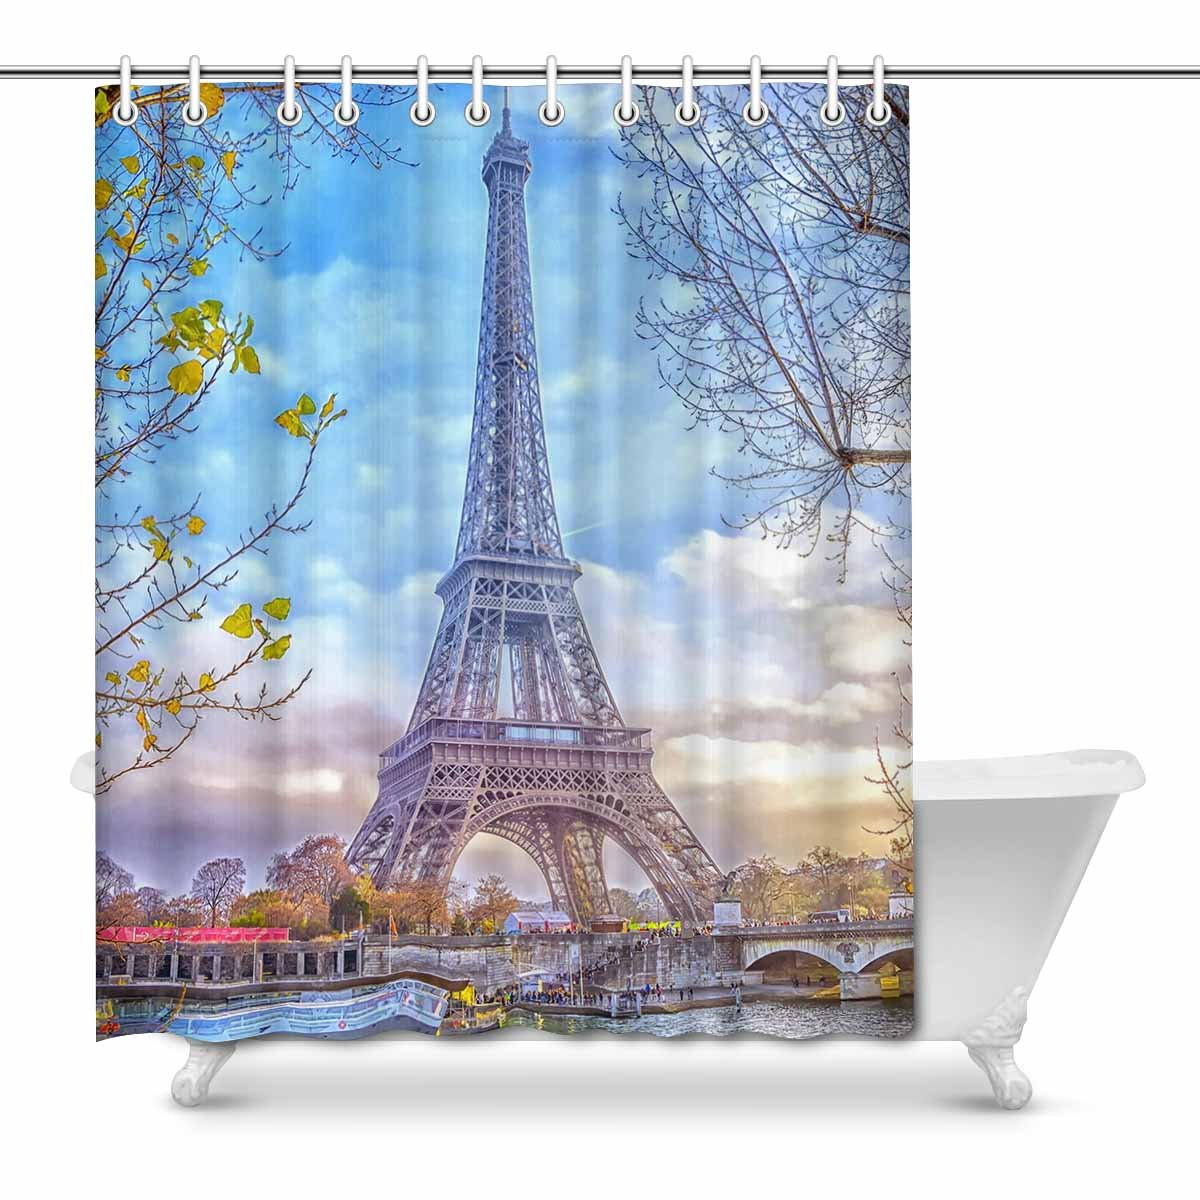 Romantic Paris Eiffel Tower Waterproof Fabric Shower Curtain Set Bathroom Hooks